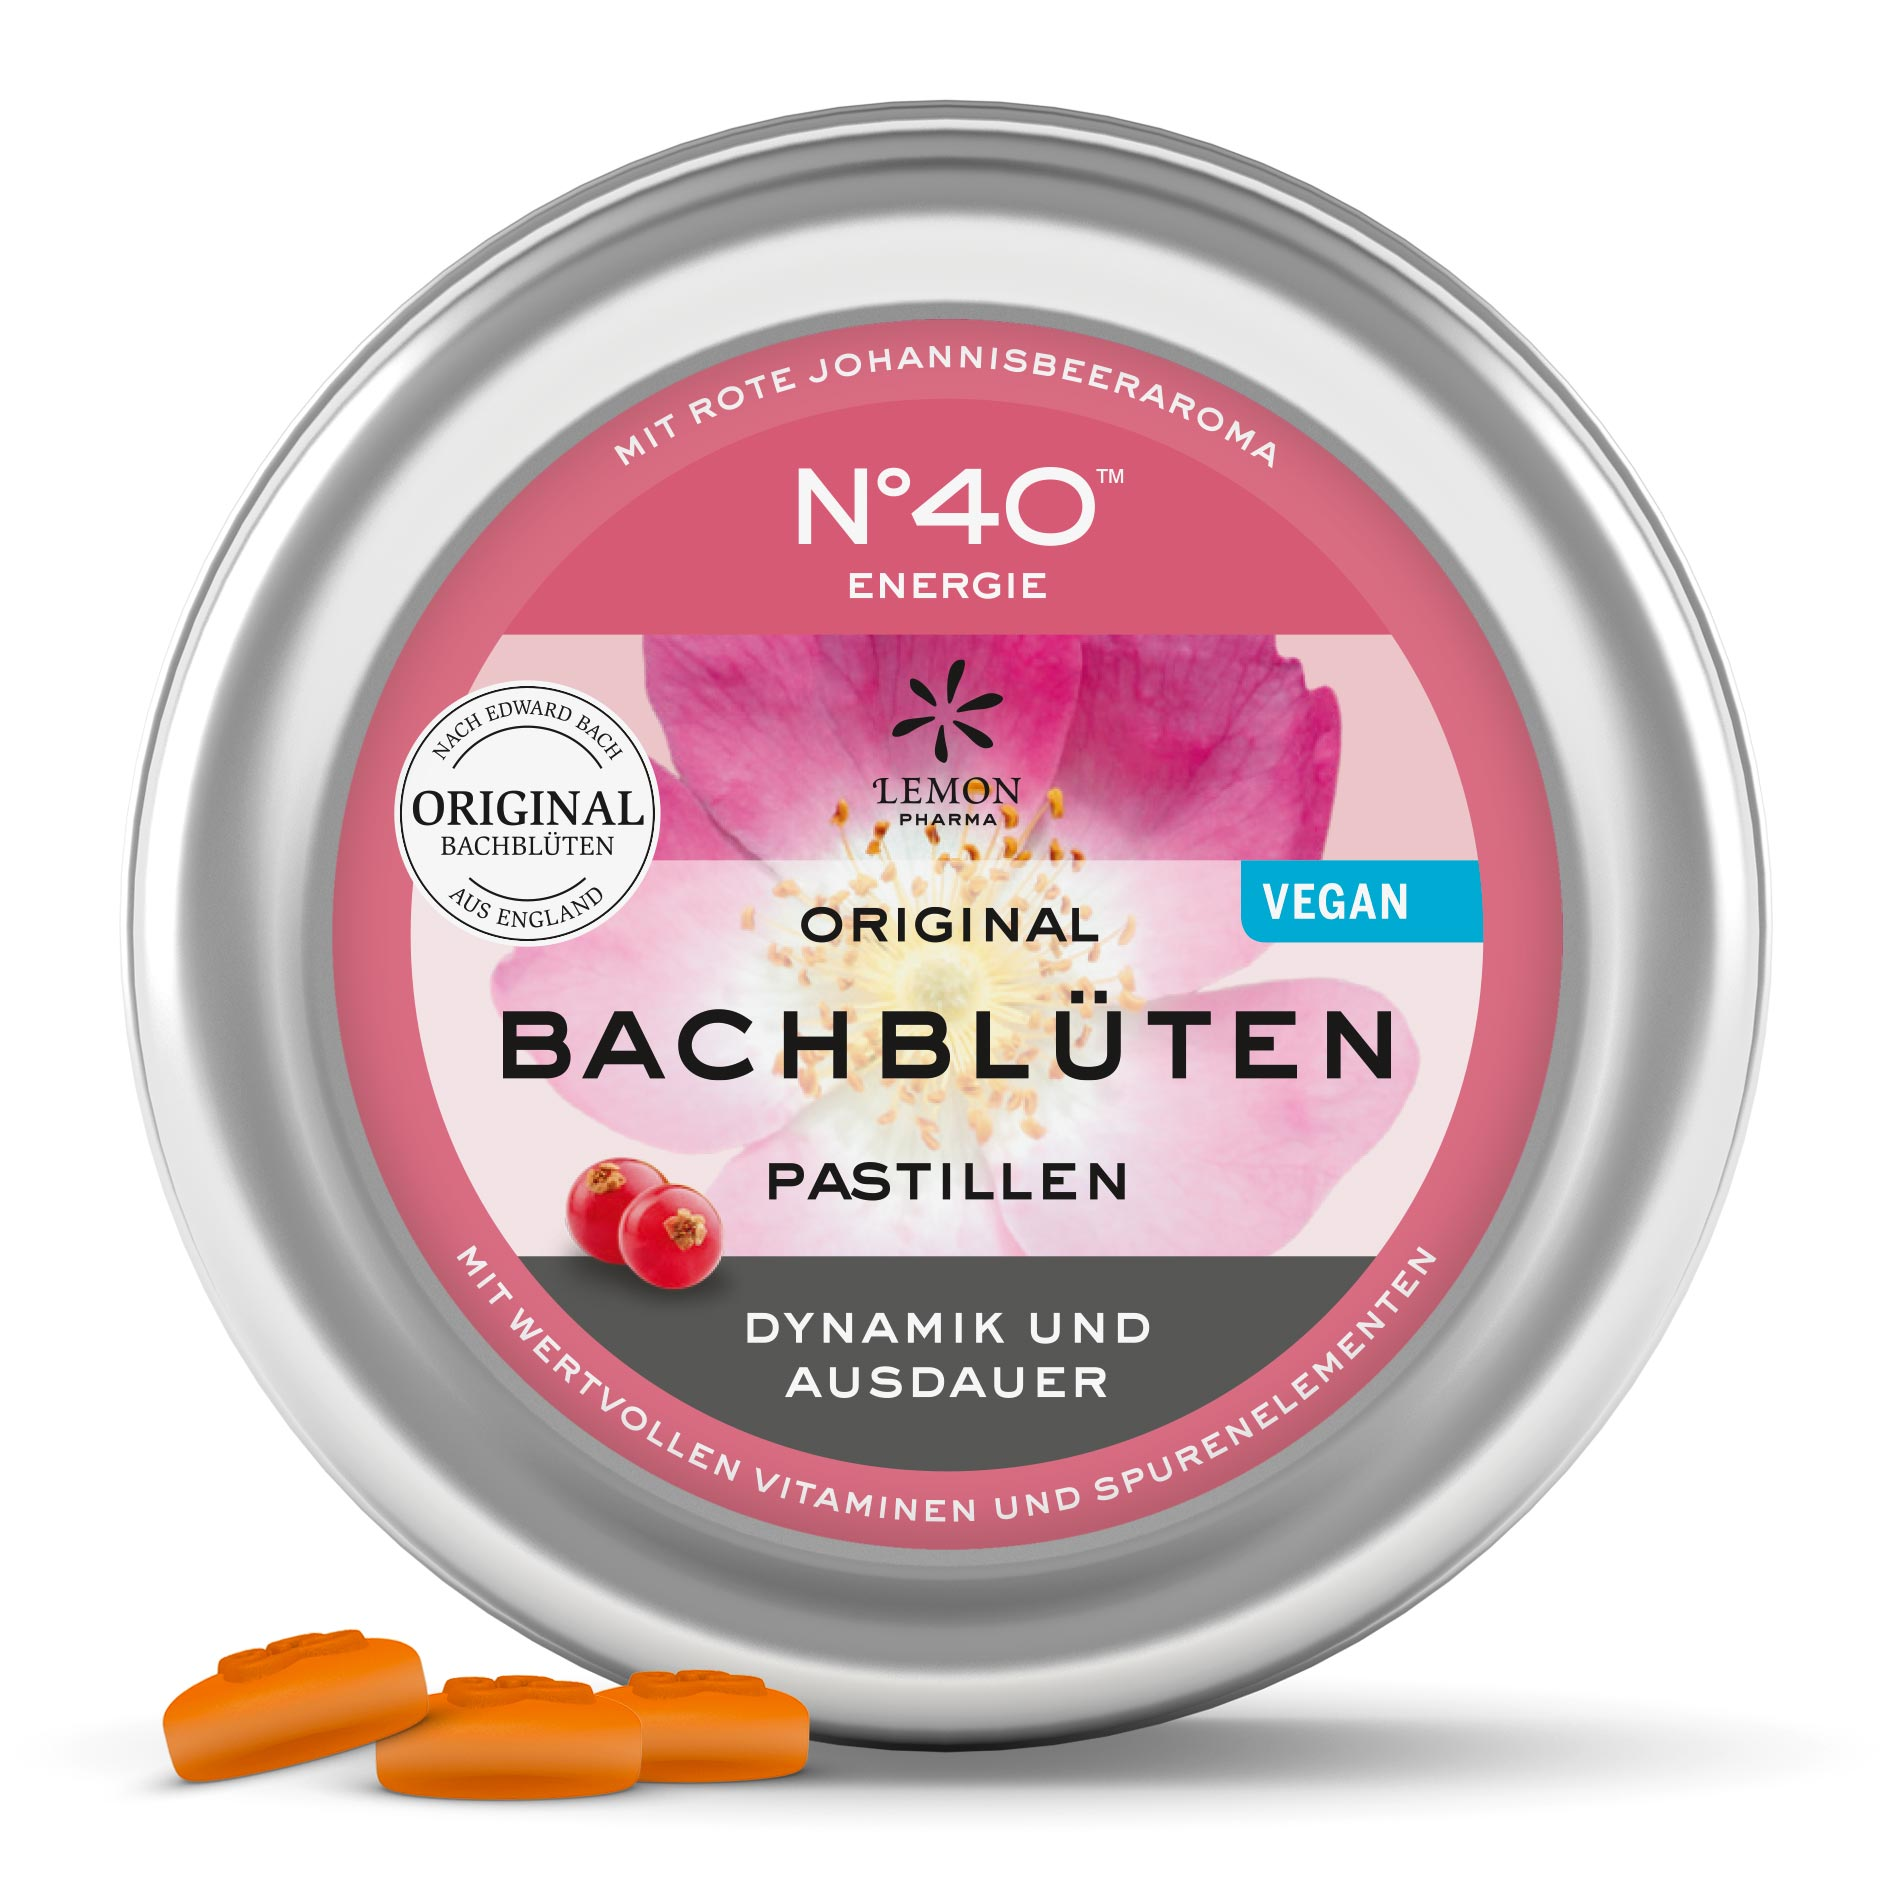 Lemon Pharma Original Bachblüten Nr 40 Energie Pastillen Dynamik und Ausdauer